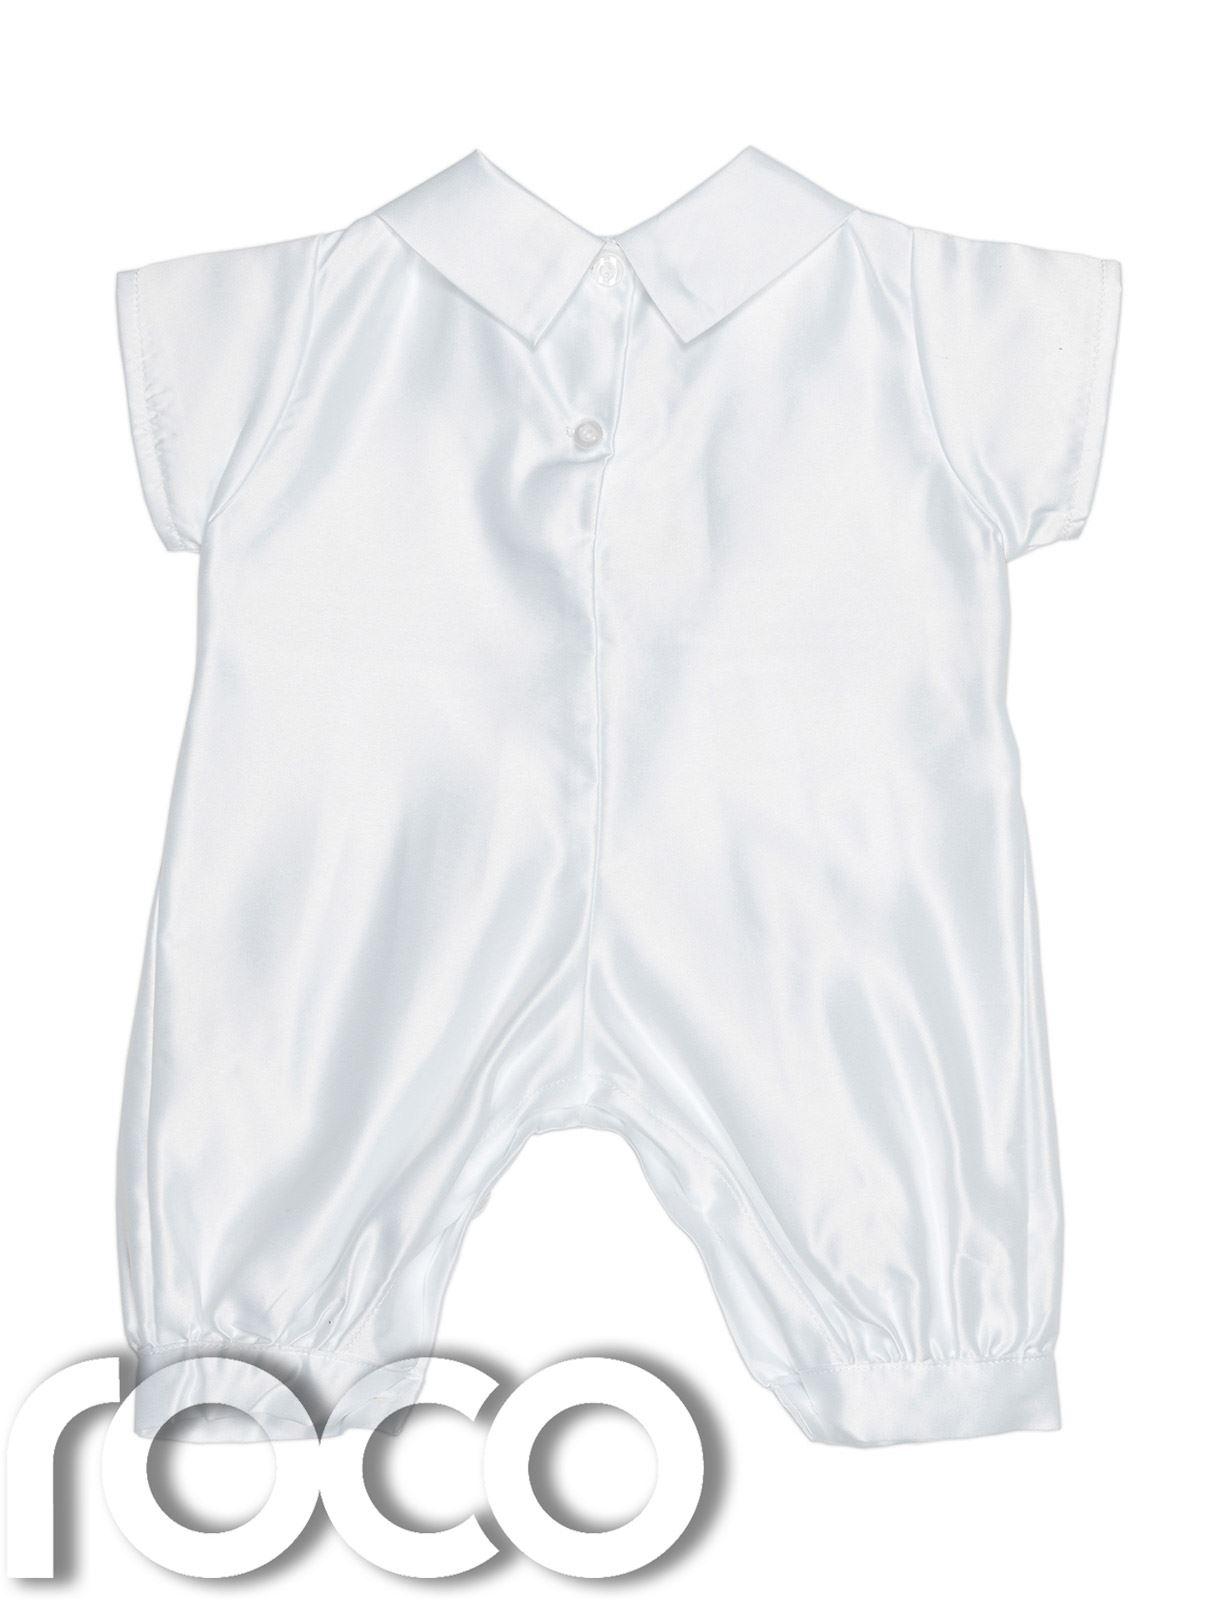 baby jungen taufe outfit wei strampelanzug wei blau baby strampler ebay. Black Bedroom Furniture Sets. Home Design Ideas